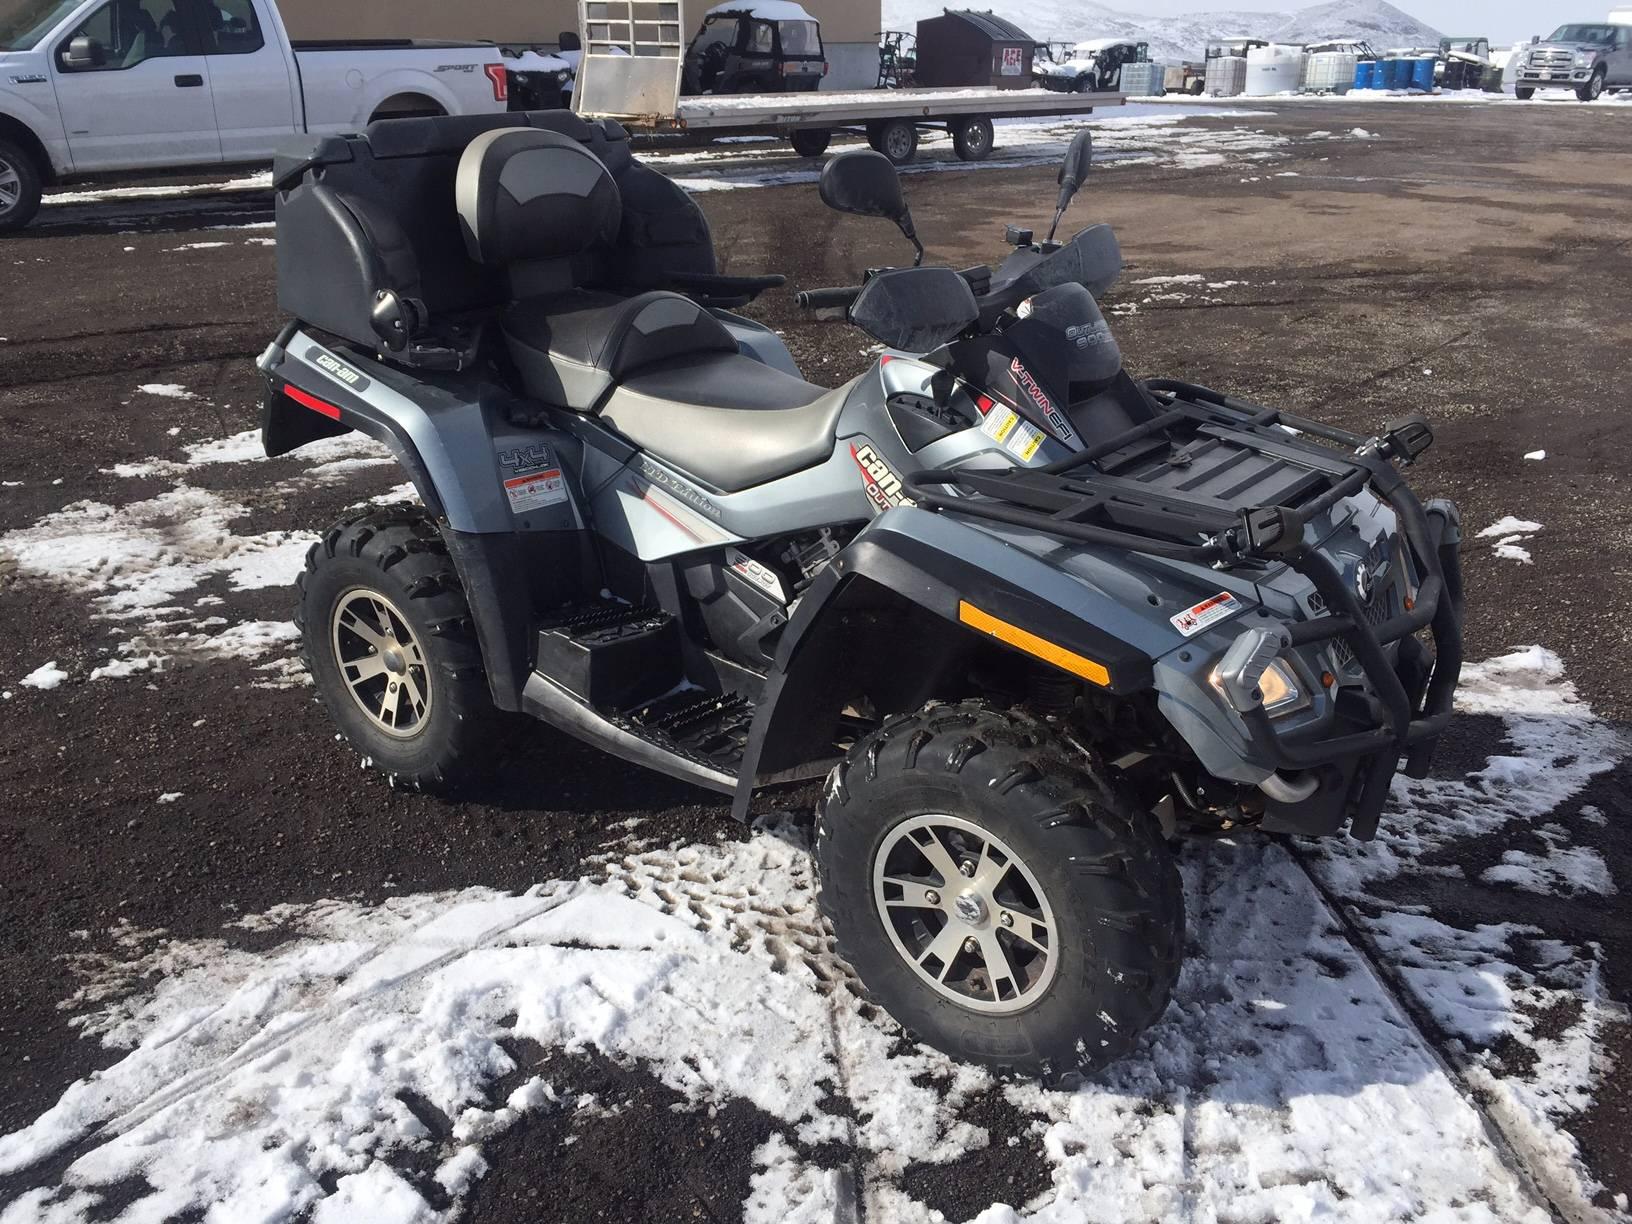 2007 Can-Am Outlander Max XT 800 LTD in Kamas, Utah